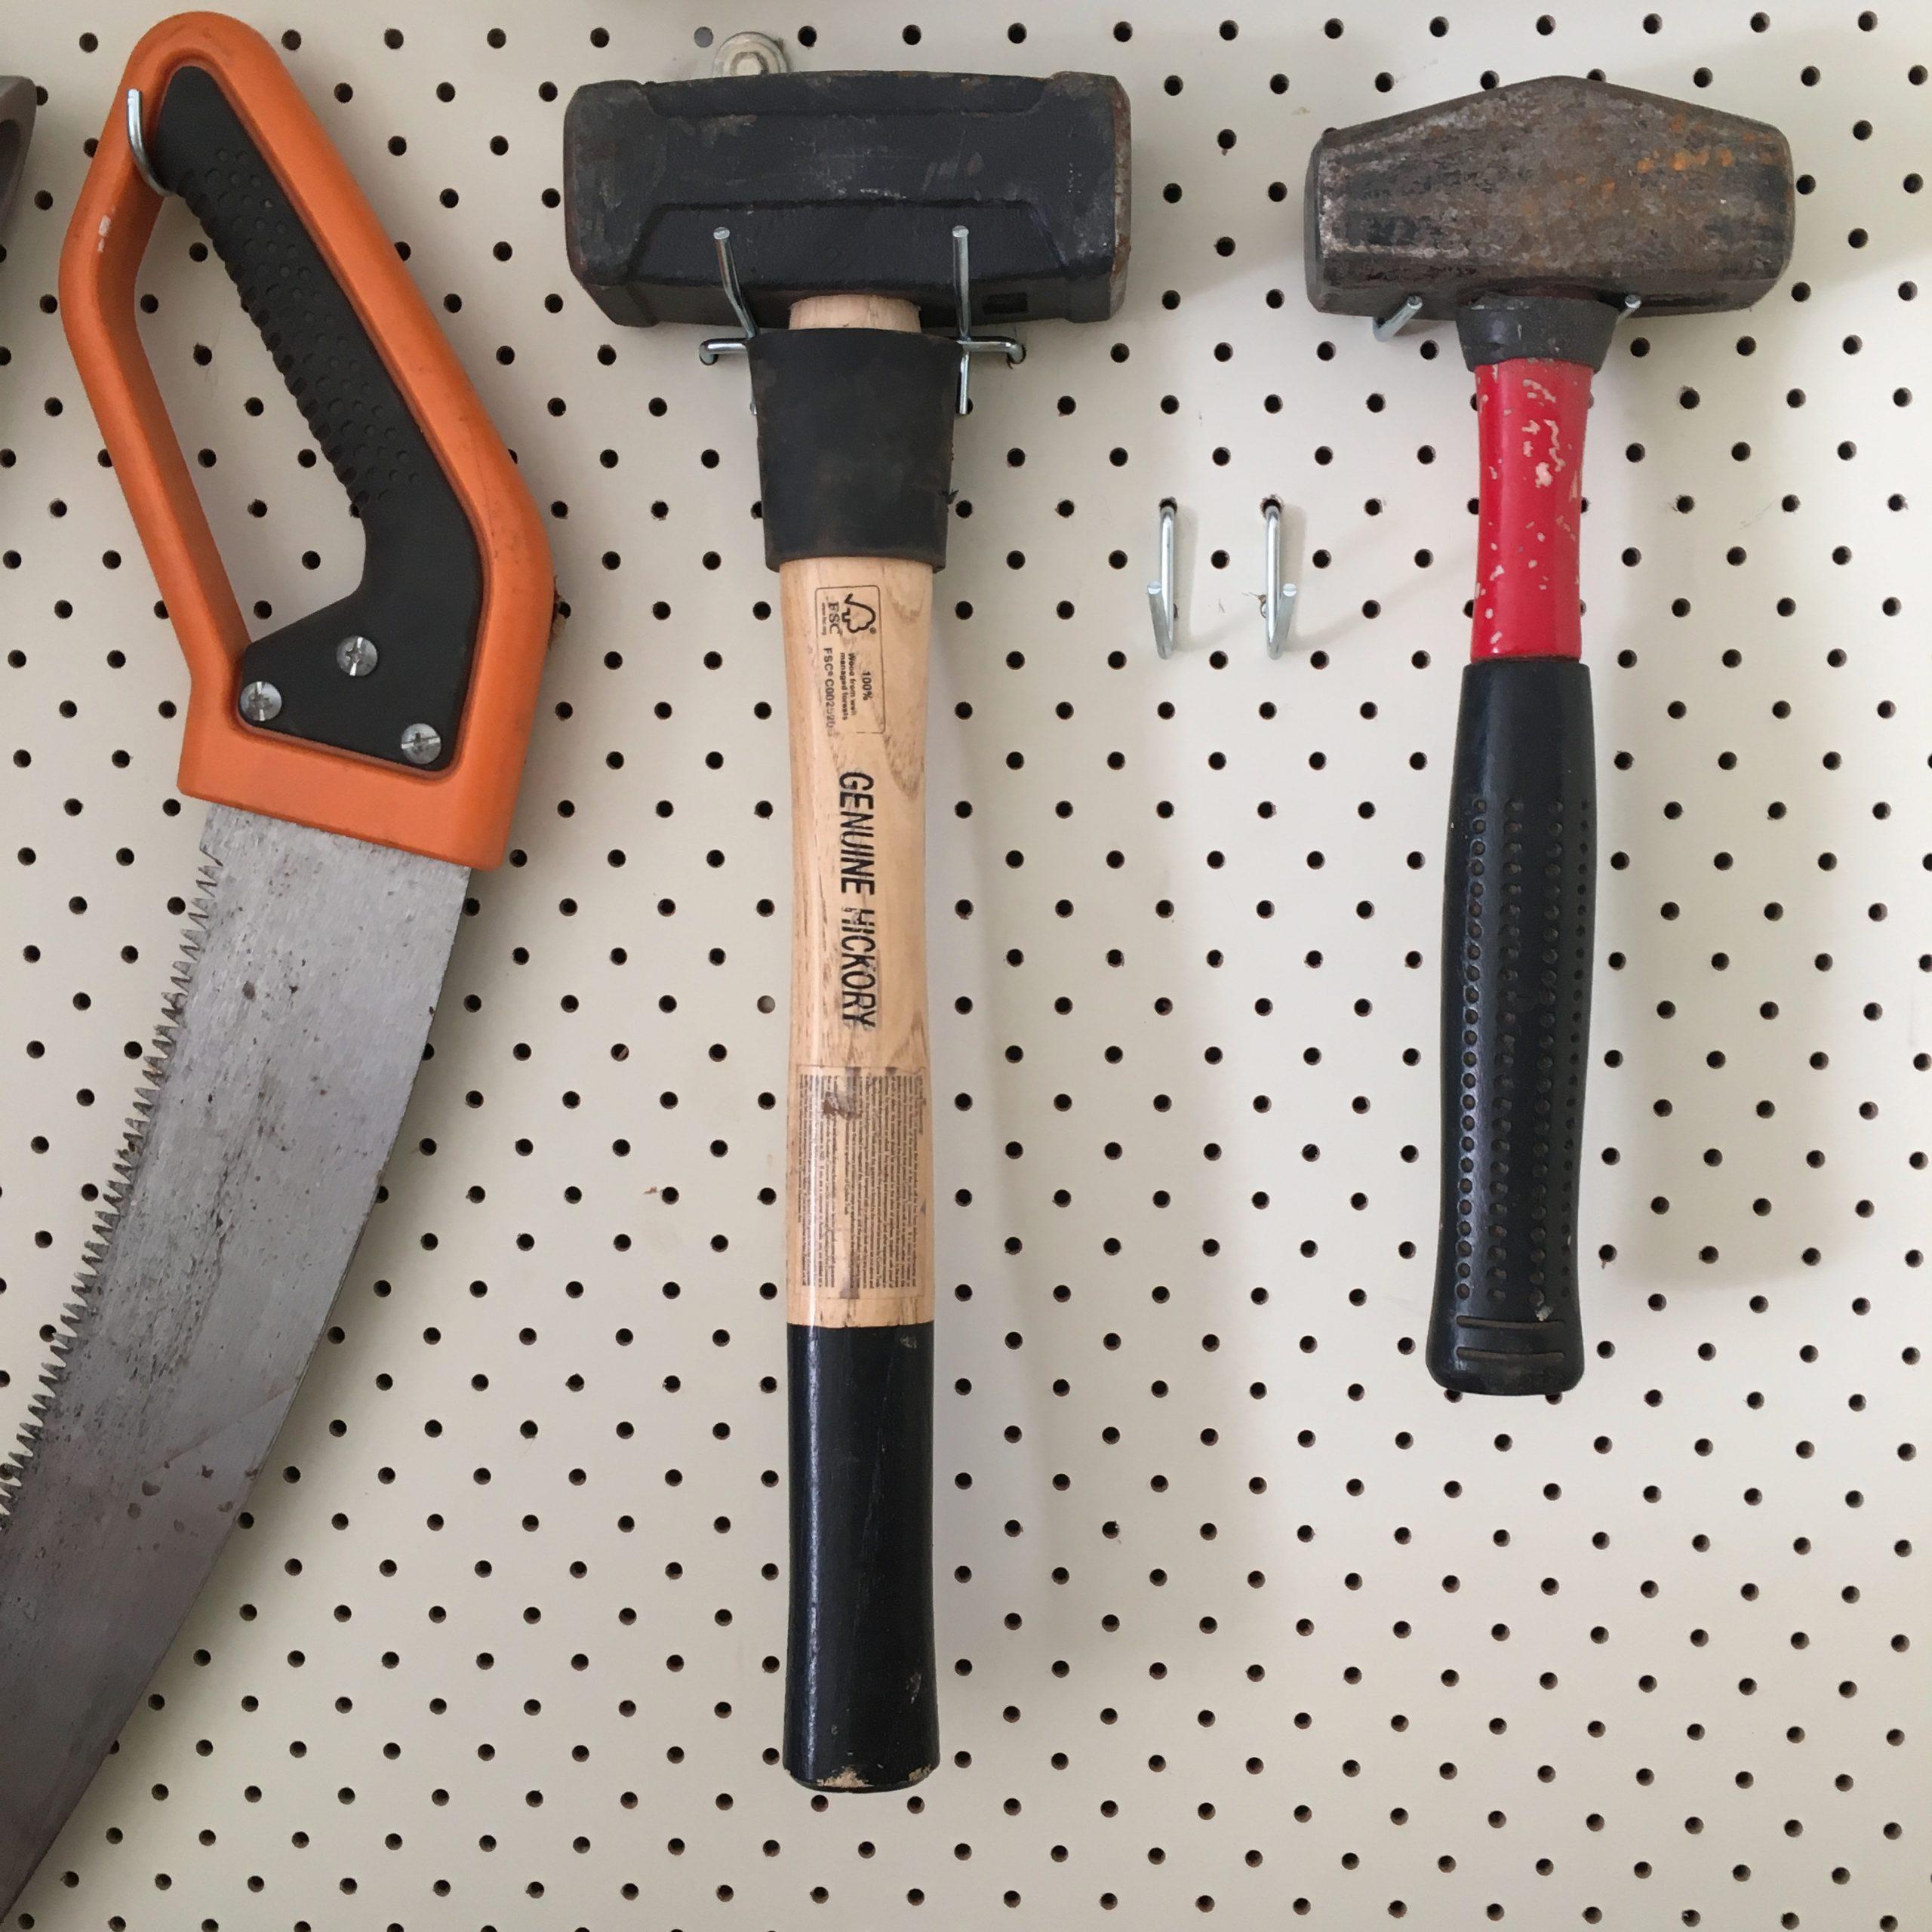 Tool Garage Organisation - The Organising Bee Canberra